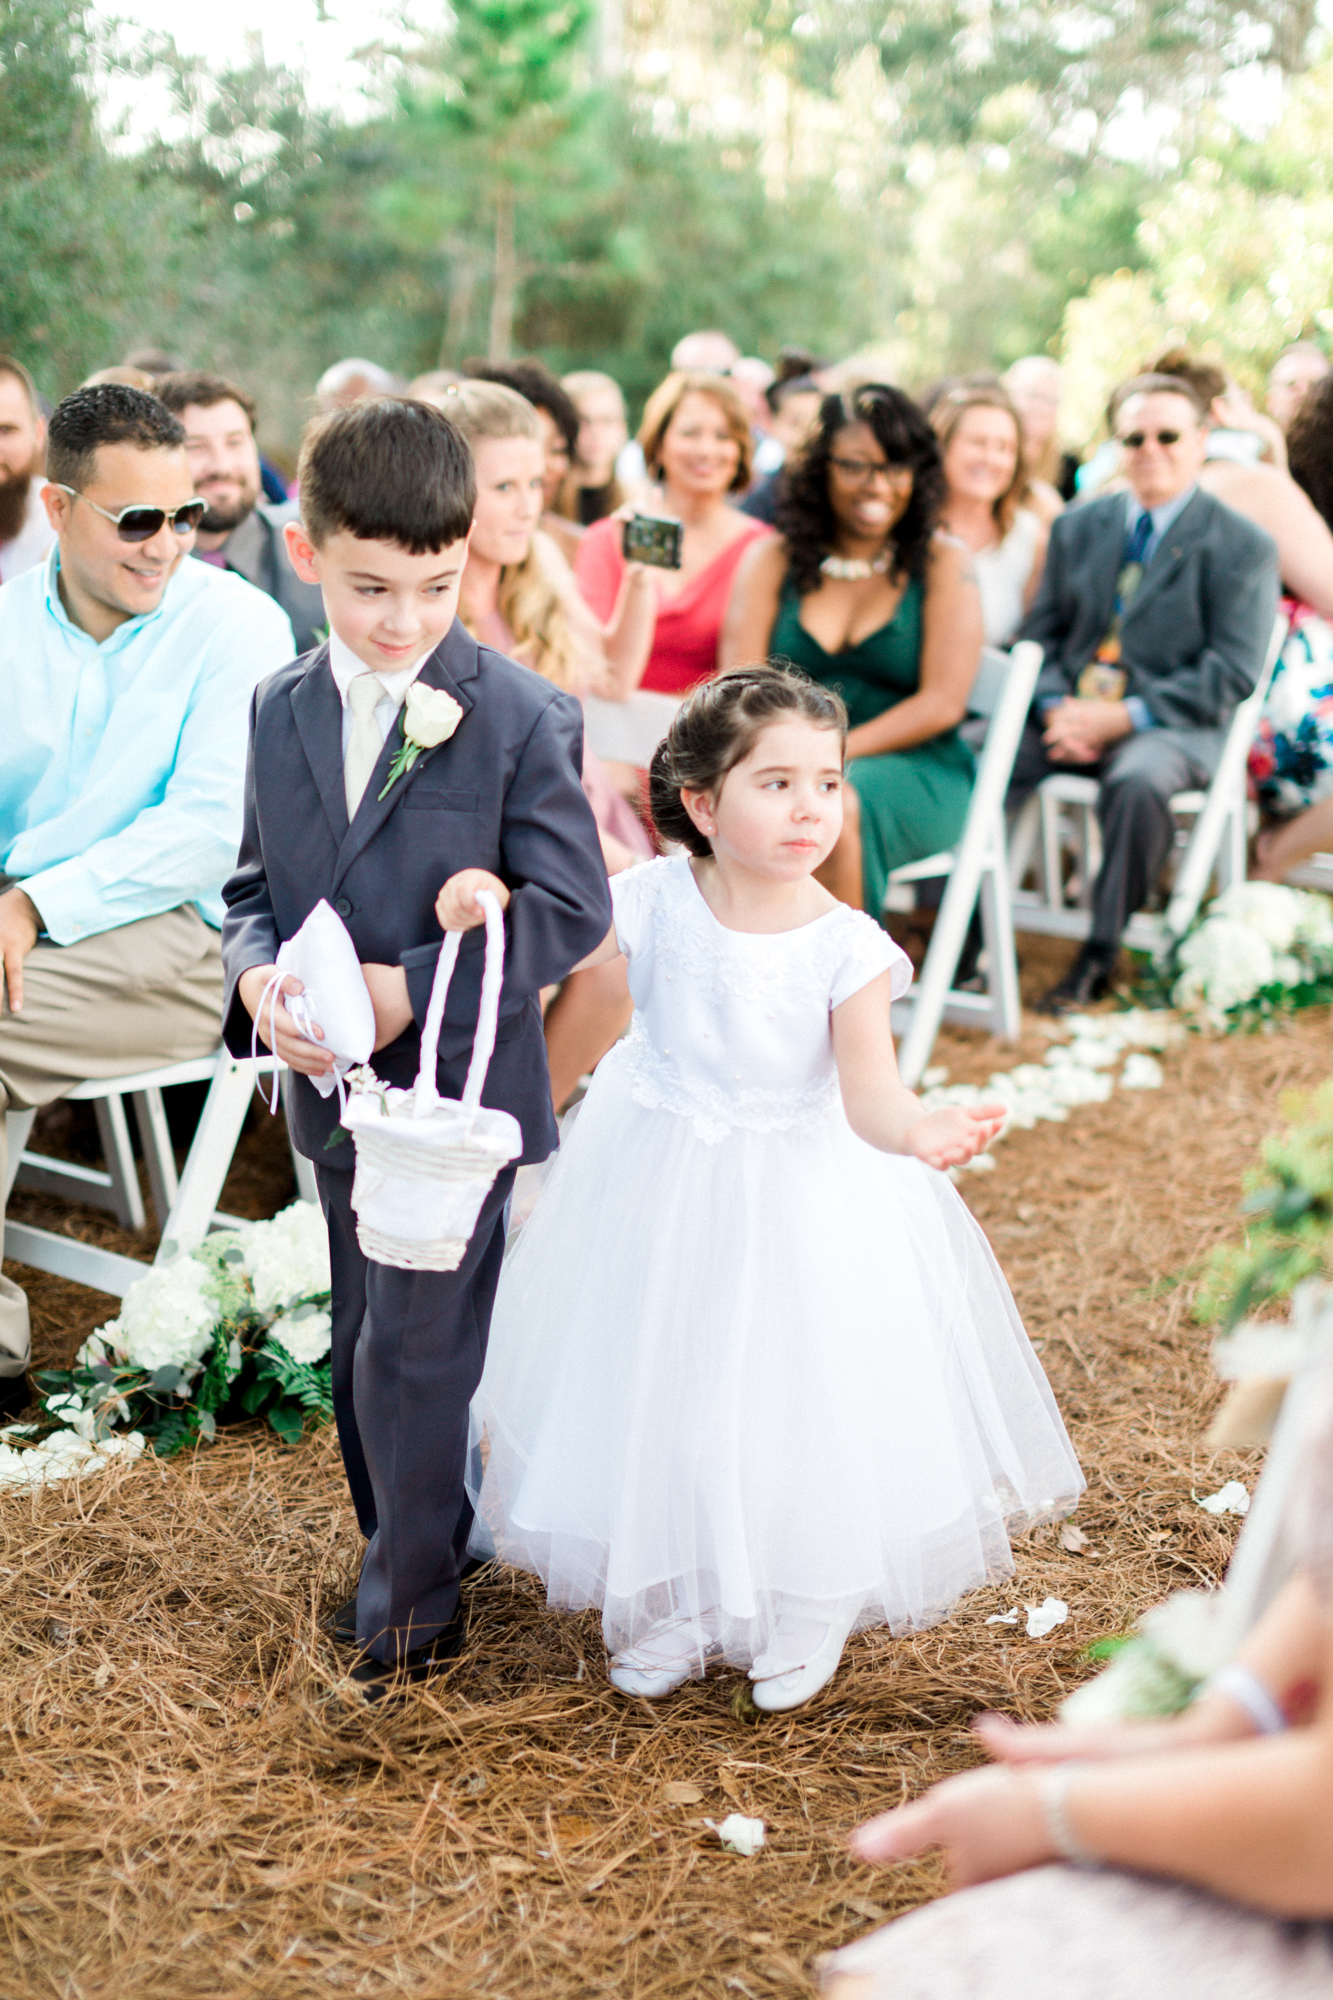 jessica-bellinger-photography-harmony-golf-preserve-wedding-photos-9072.jpg